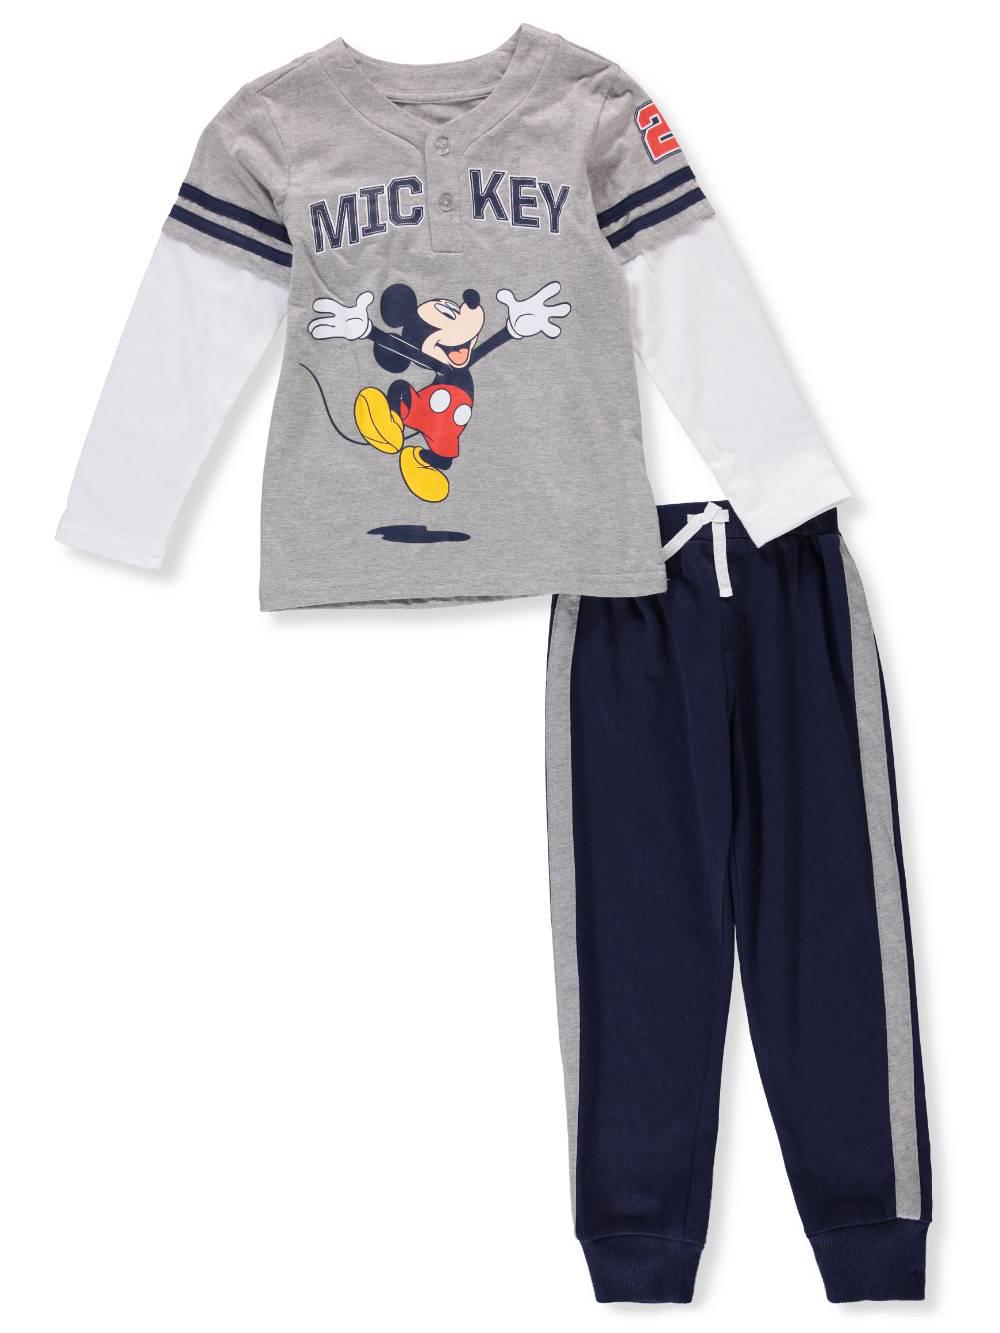 e97350ef0 Disney Mickey Mouse Boys' 2-Piece Pants Set Outfit